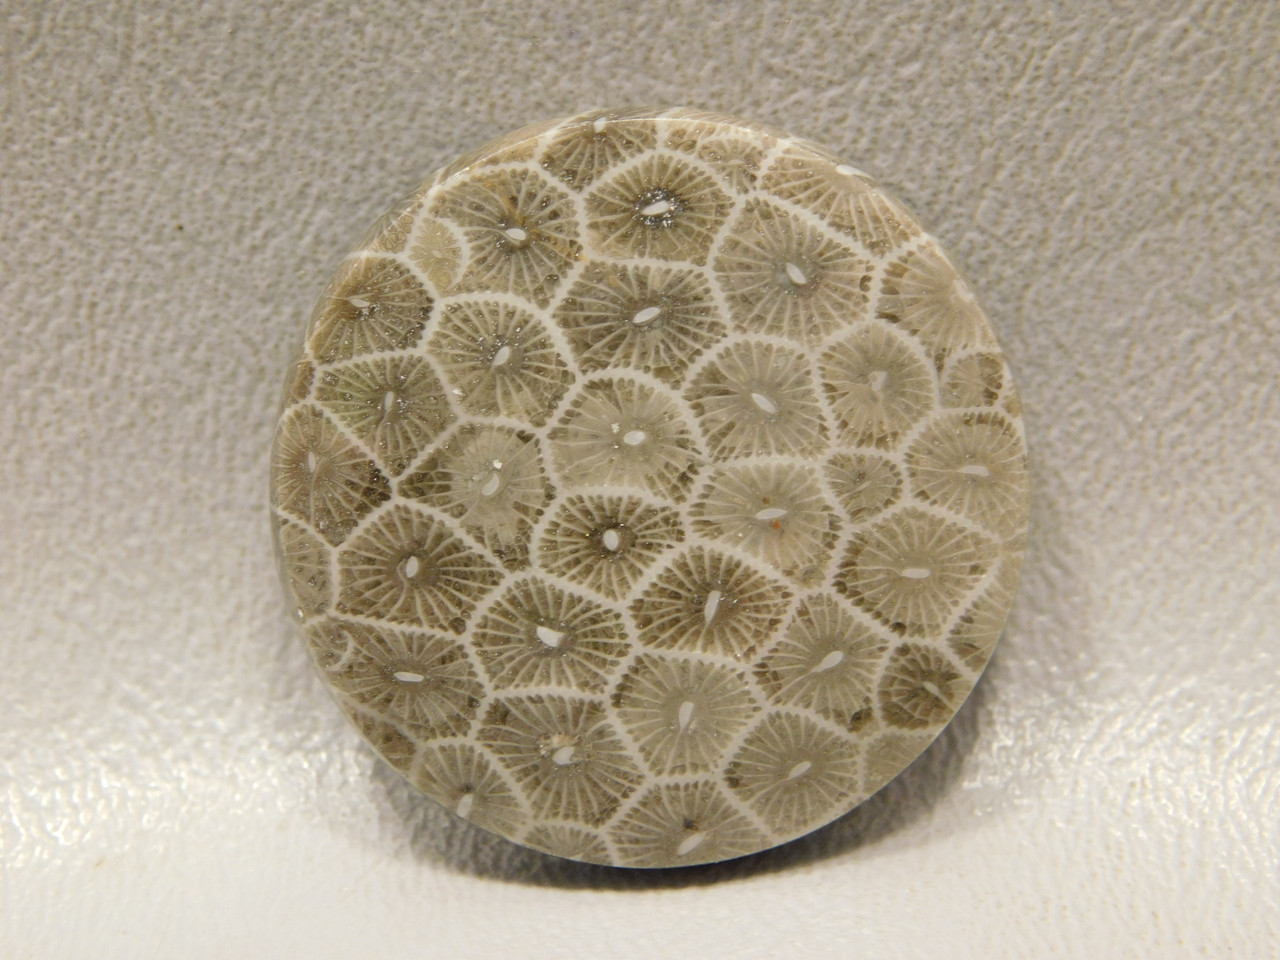 Flower Jasper Cabochon Loose Stones 32.5 mm Round #f7